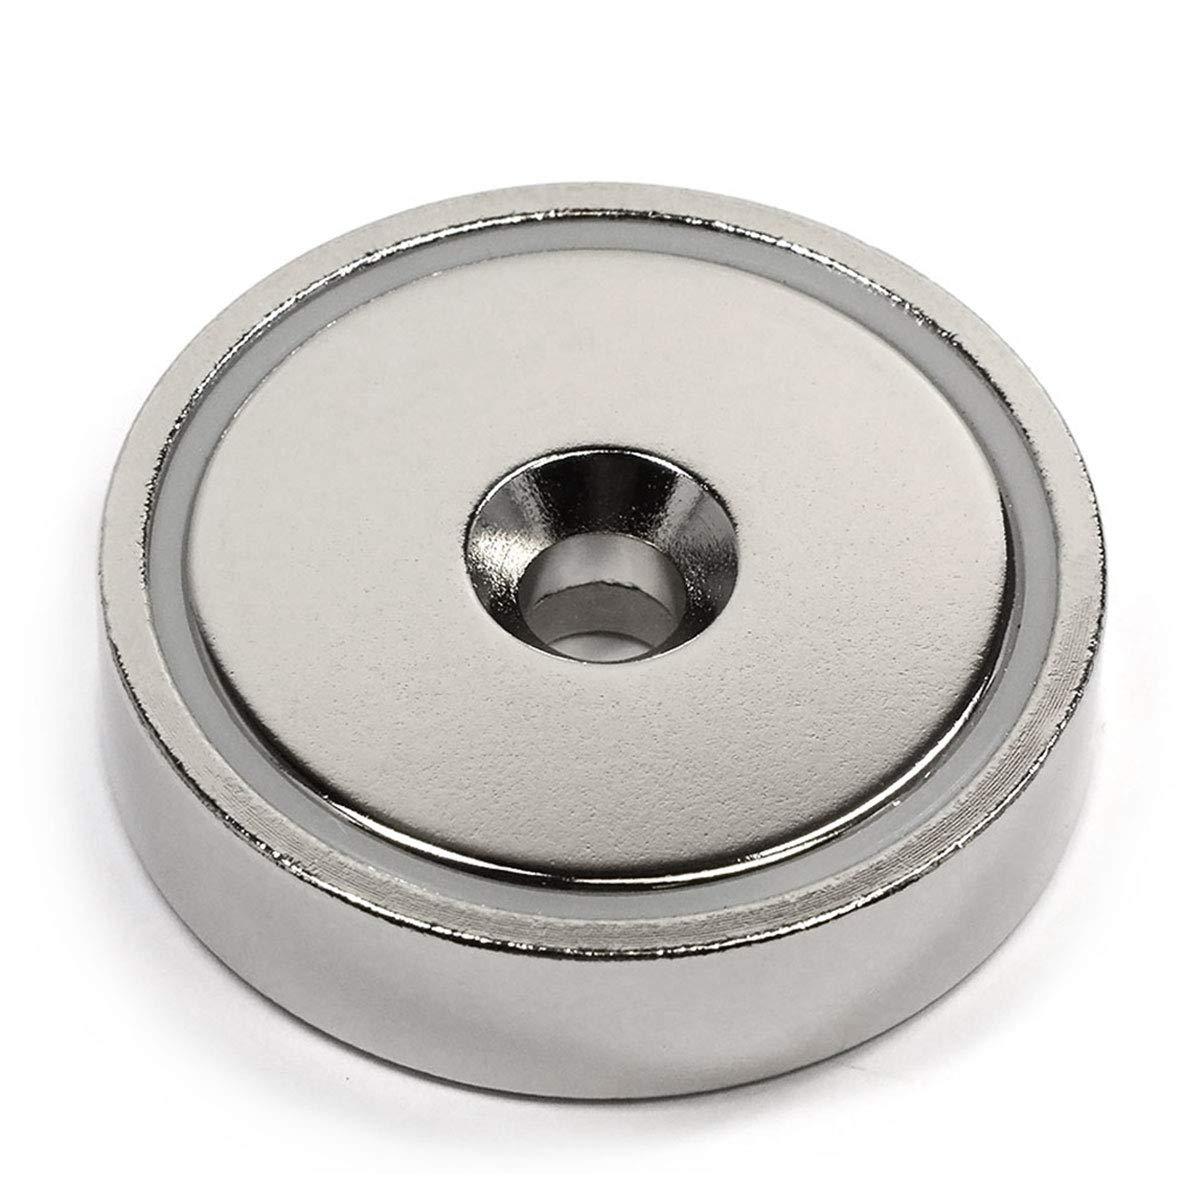 CMS Magnetics 150 LB Holding Power Neodymium Round Base Magnet w/Countersunk Hole 1.89'' - 1 Ct.